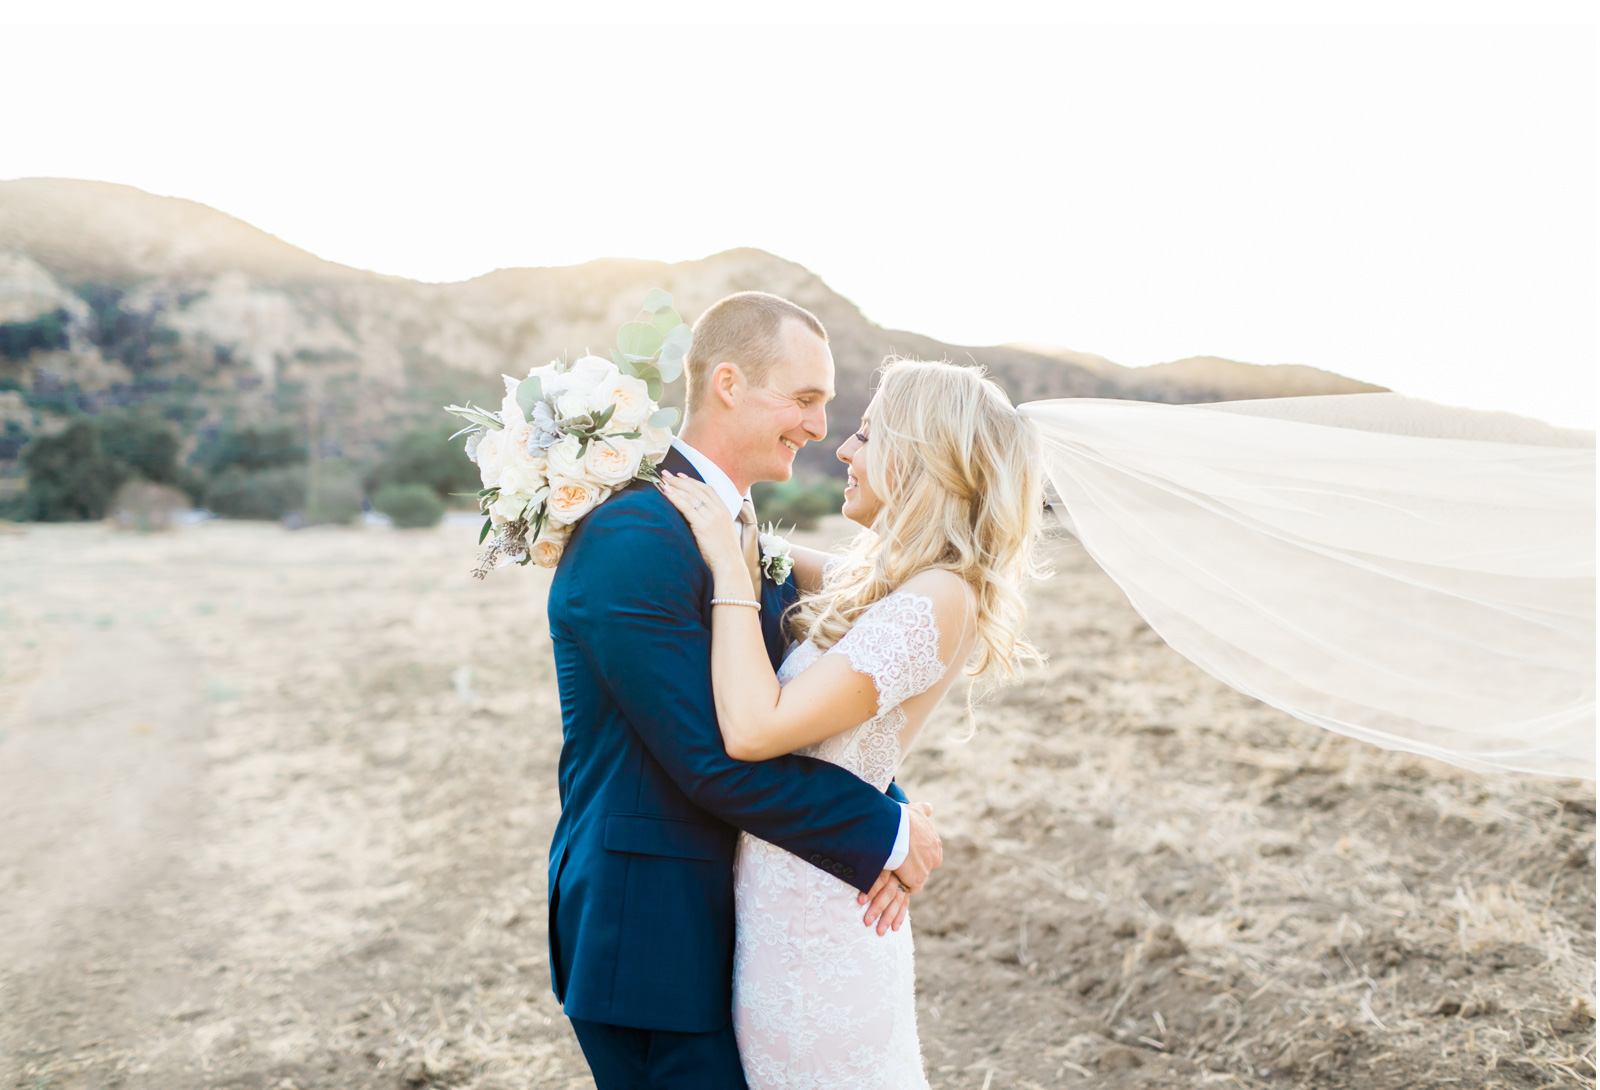 Style-Me-Pretty-Wedding-Photographer-Natalie-Schutt-Photography-Calfornia-San-Luis-Obispo_17.jpg